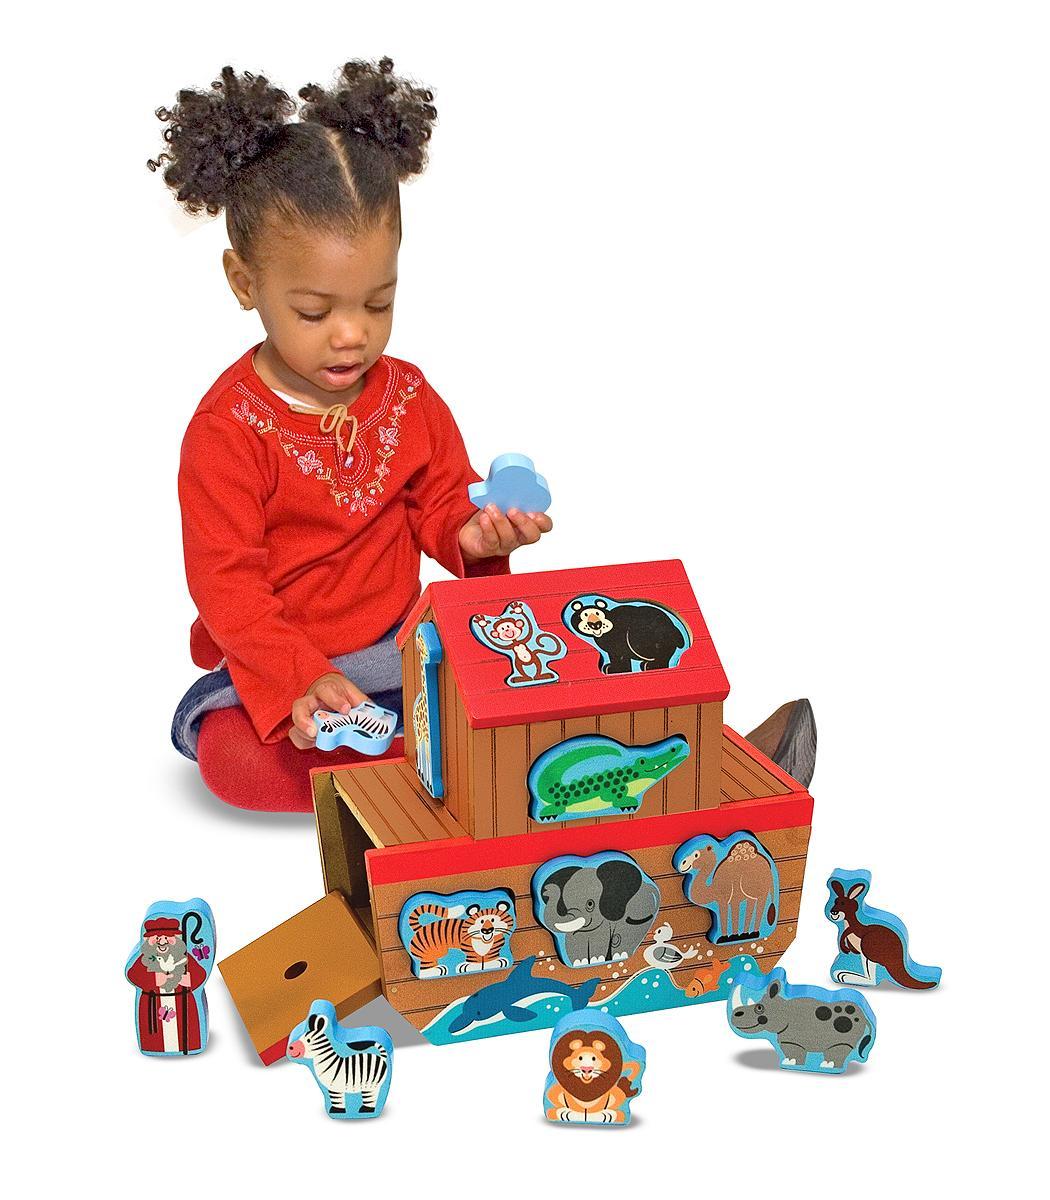 Toys For 45 Year Olds : Amazon melissa doug noah s ark wooden shape sorter